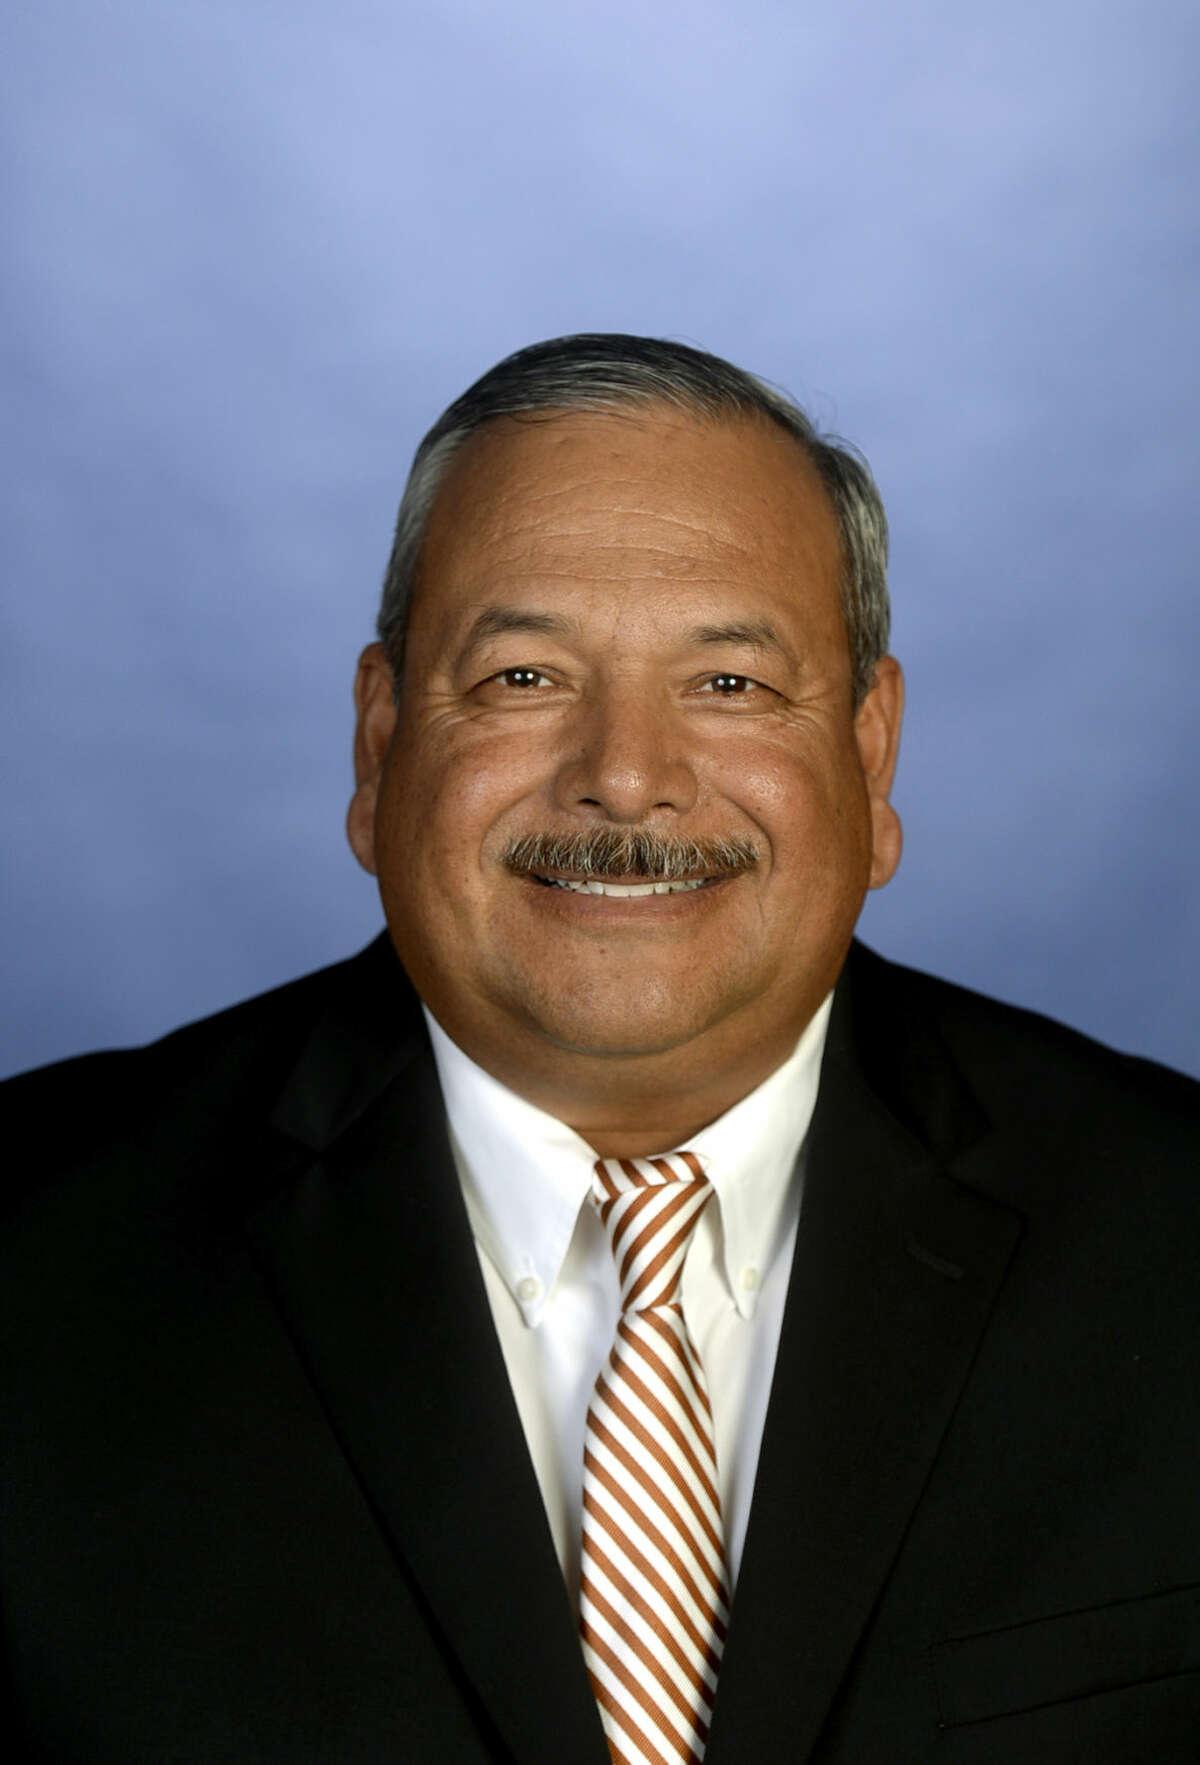 Robert Marquez, Midland ISD District 2 candidate